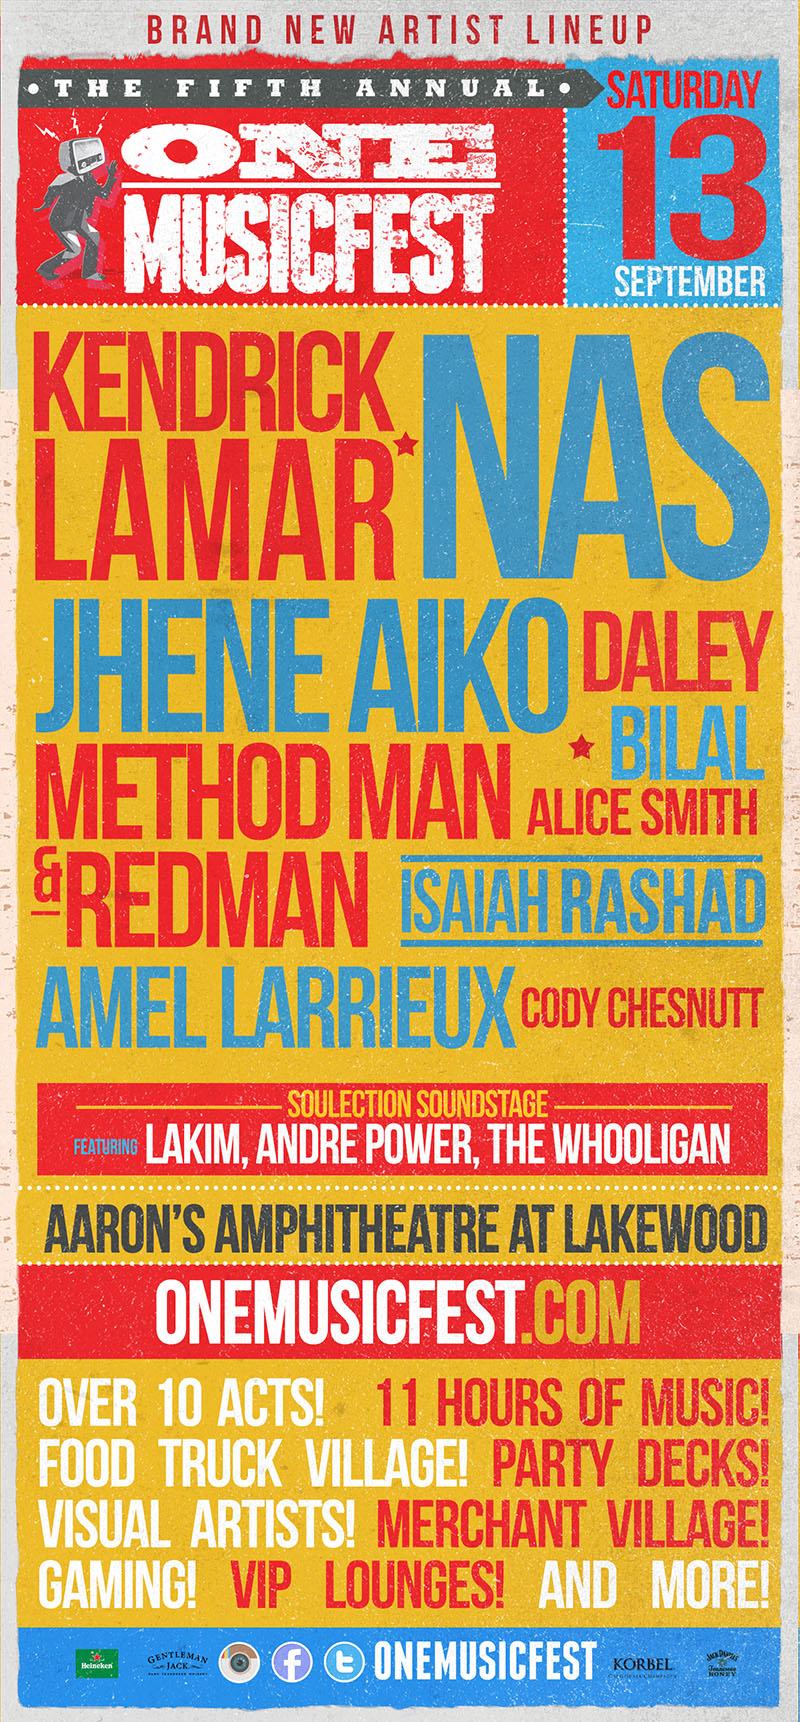 ONE Musicfest lineup